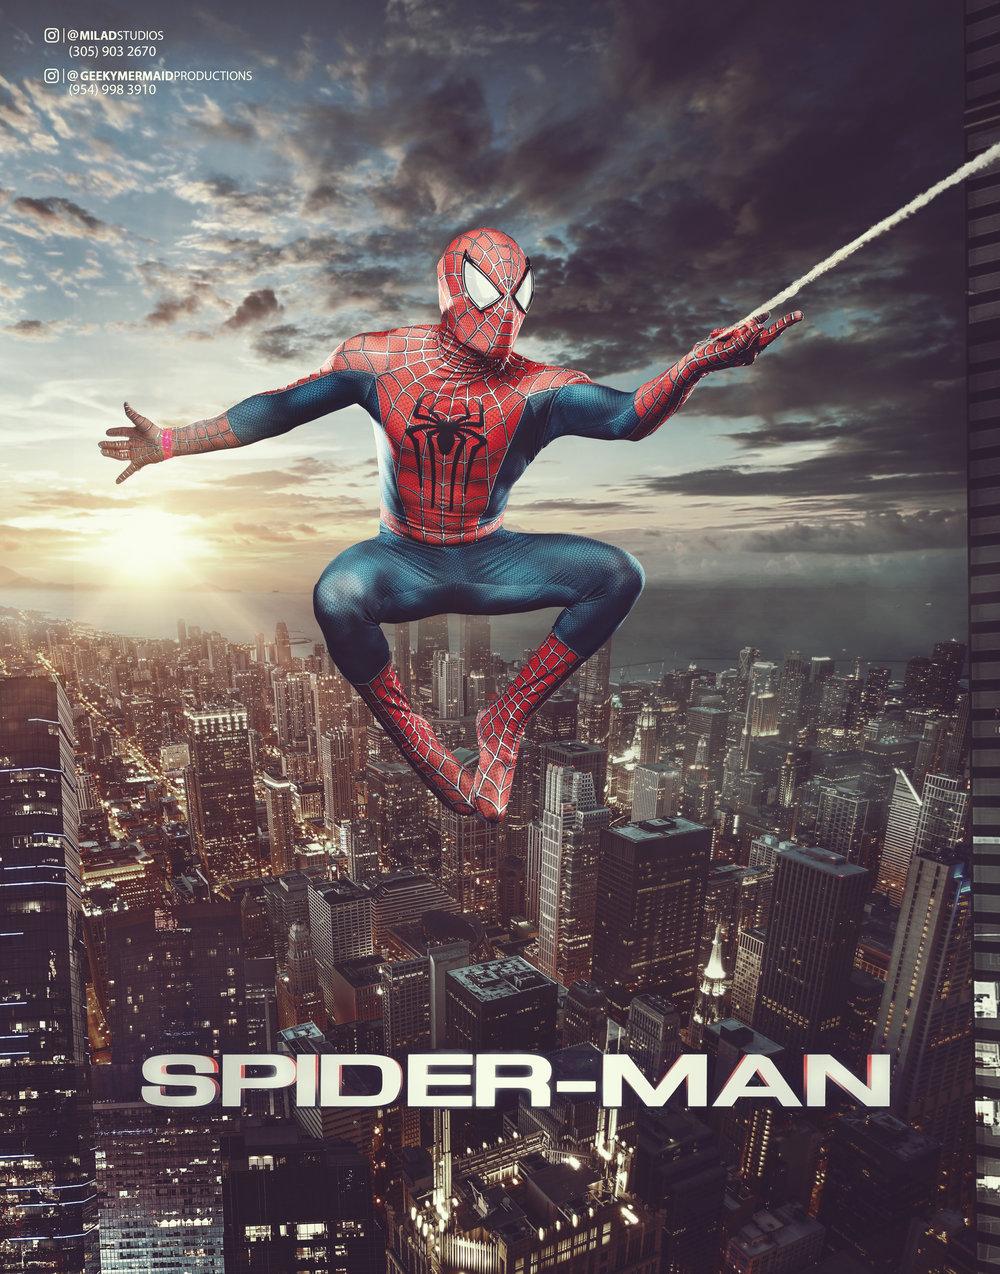 Spiderman 3 a.jpg